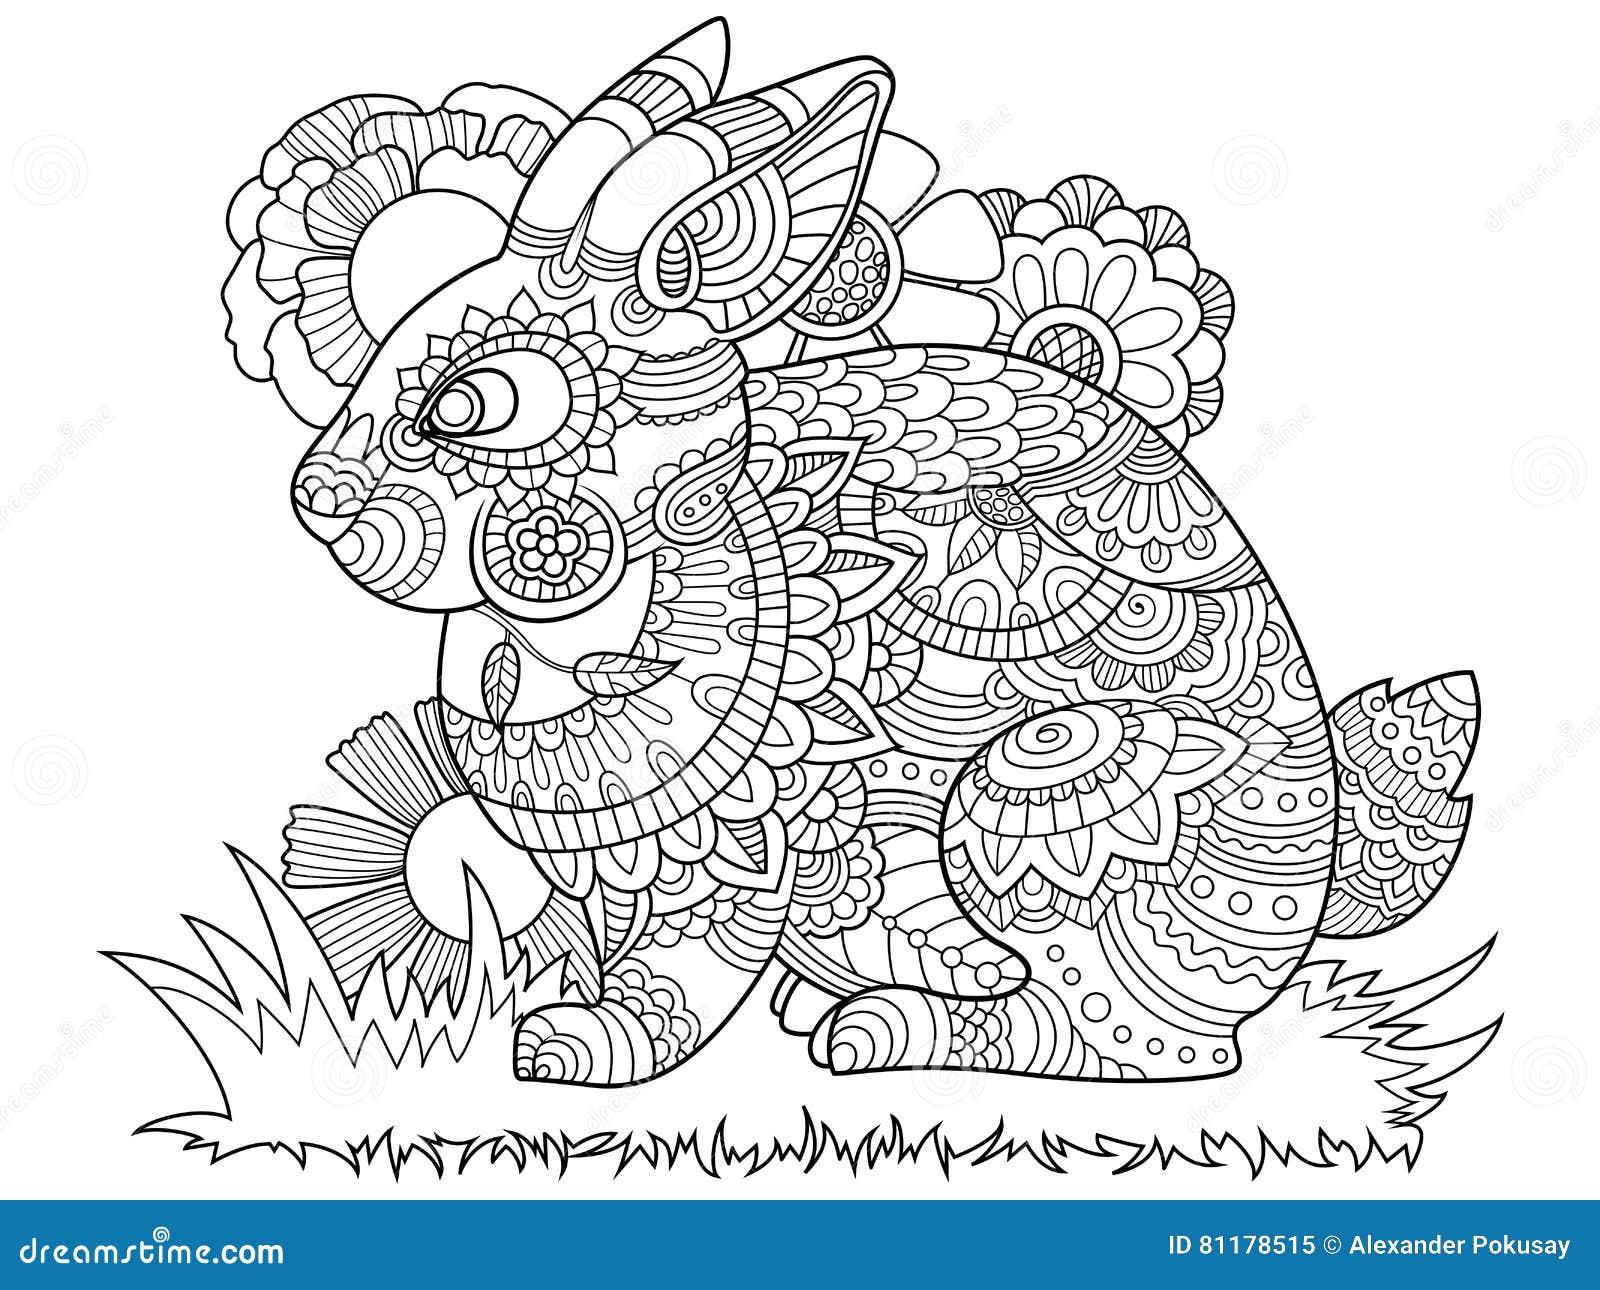 Coloriage adulte lapin - Coloriage a imprimer lapin ...